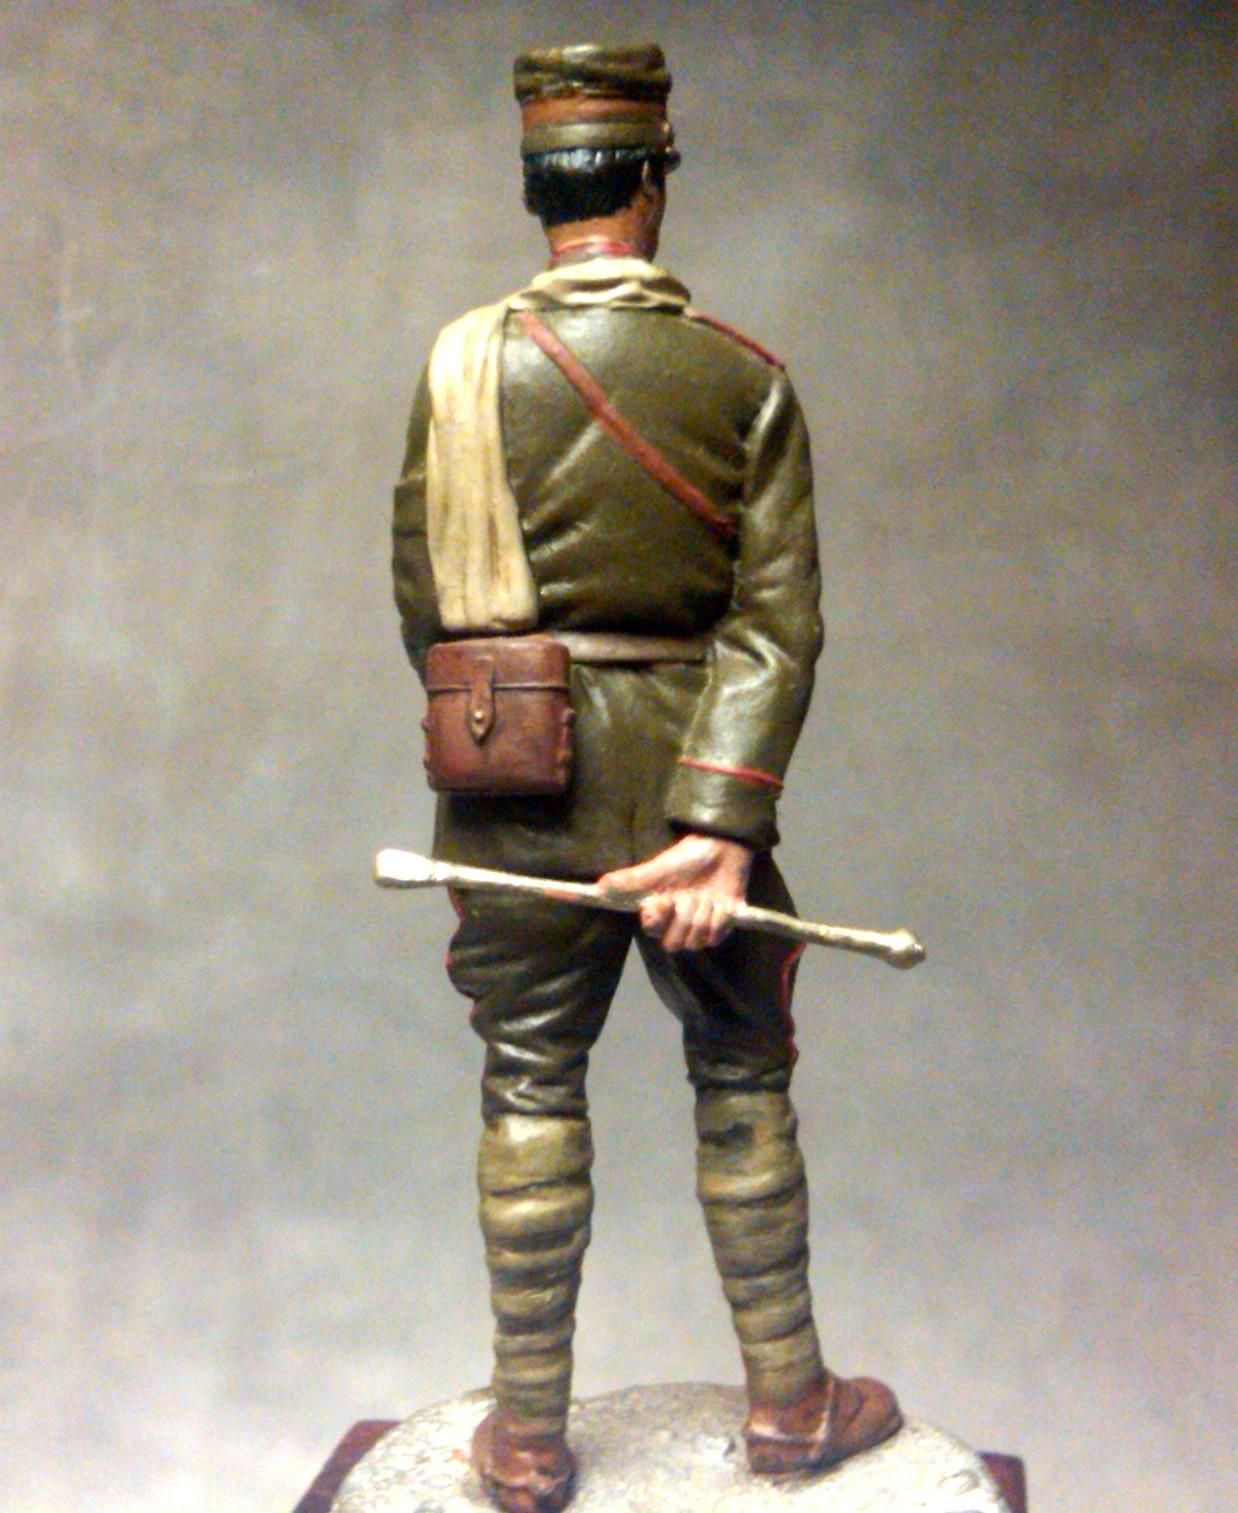 Greek+officer+balkan+wars+1912+Ελληνας+αξιωματικος+Βαλκανικοι+πόλεμοι+1912+Greekhero